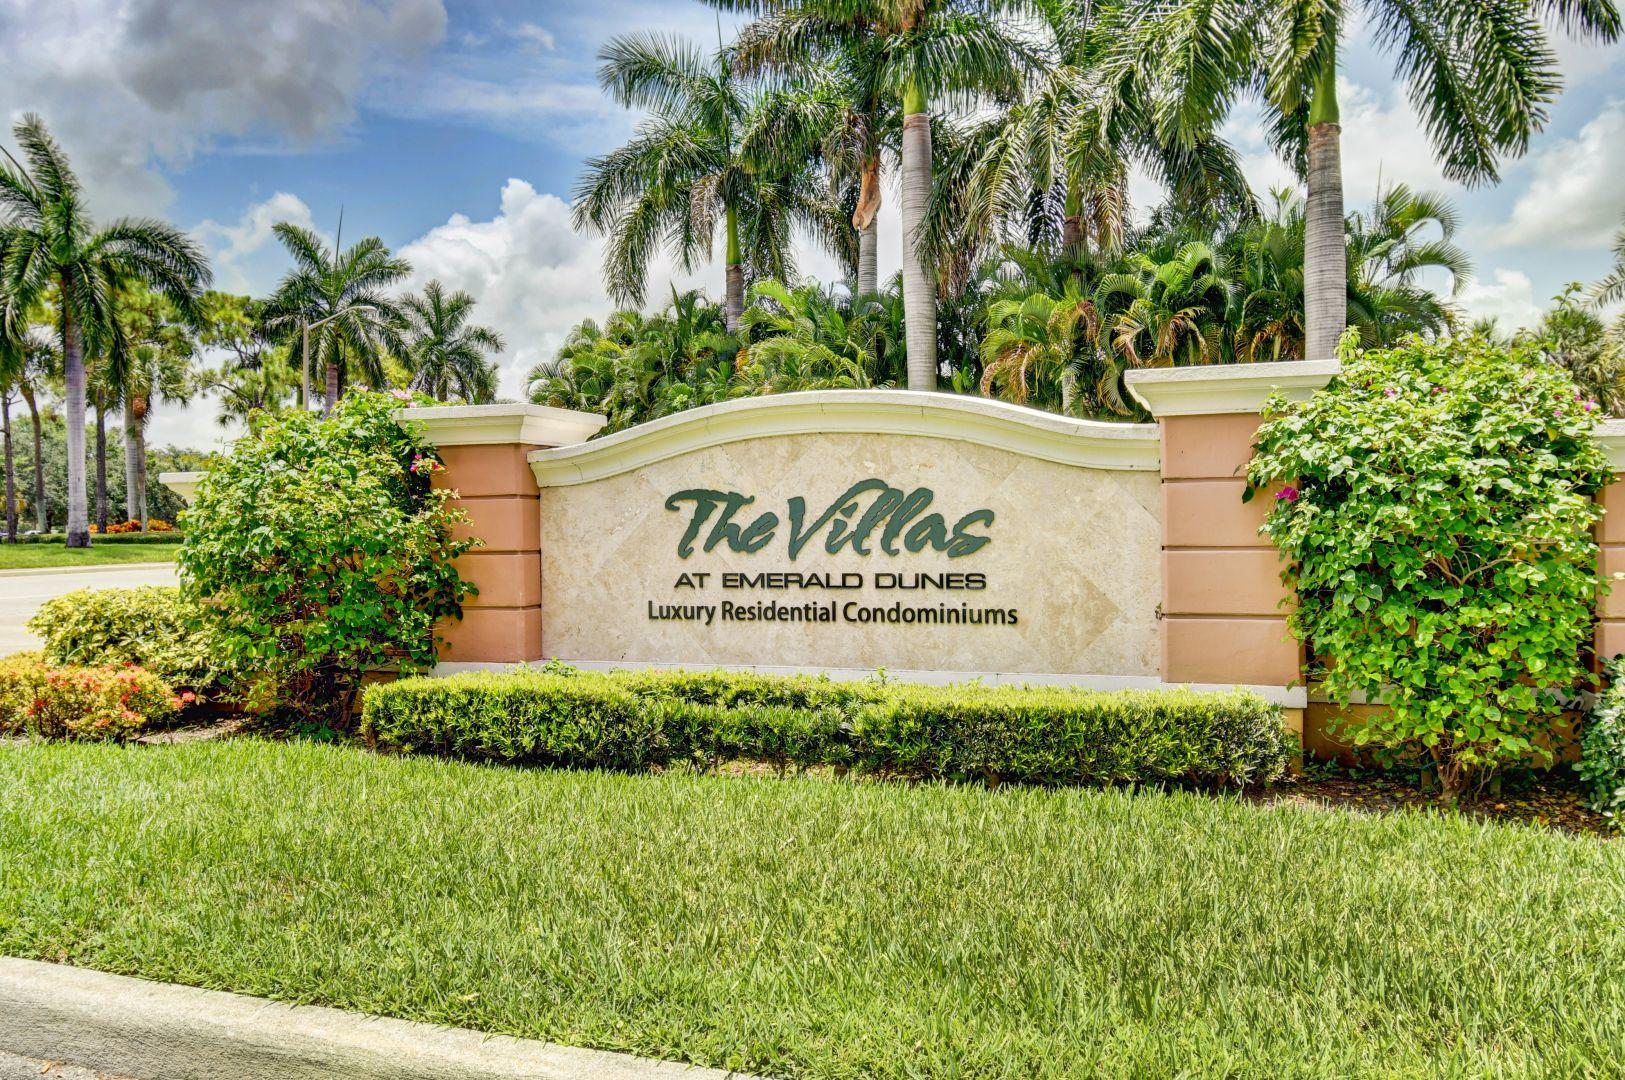 6434 Emerald Dunes Drive 301 West Palm Beach, FL 33411